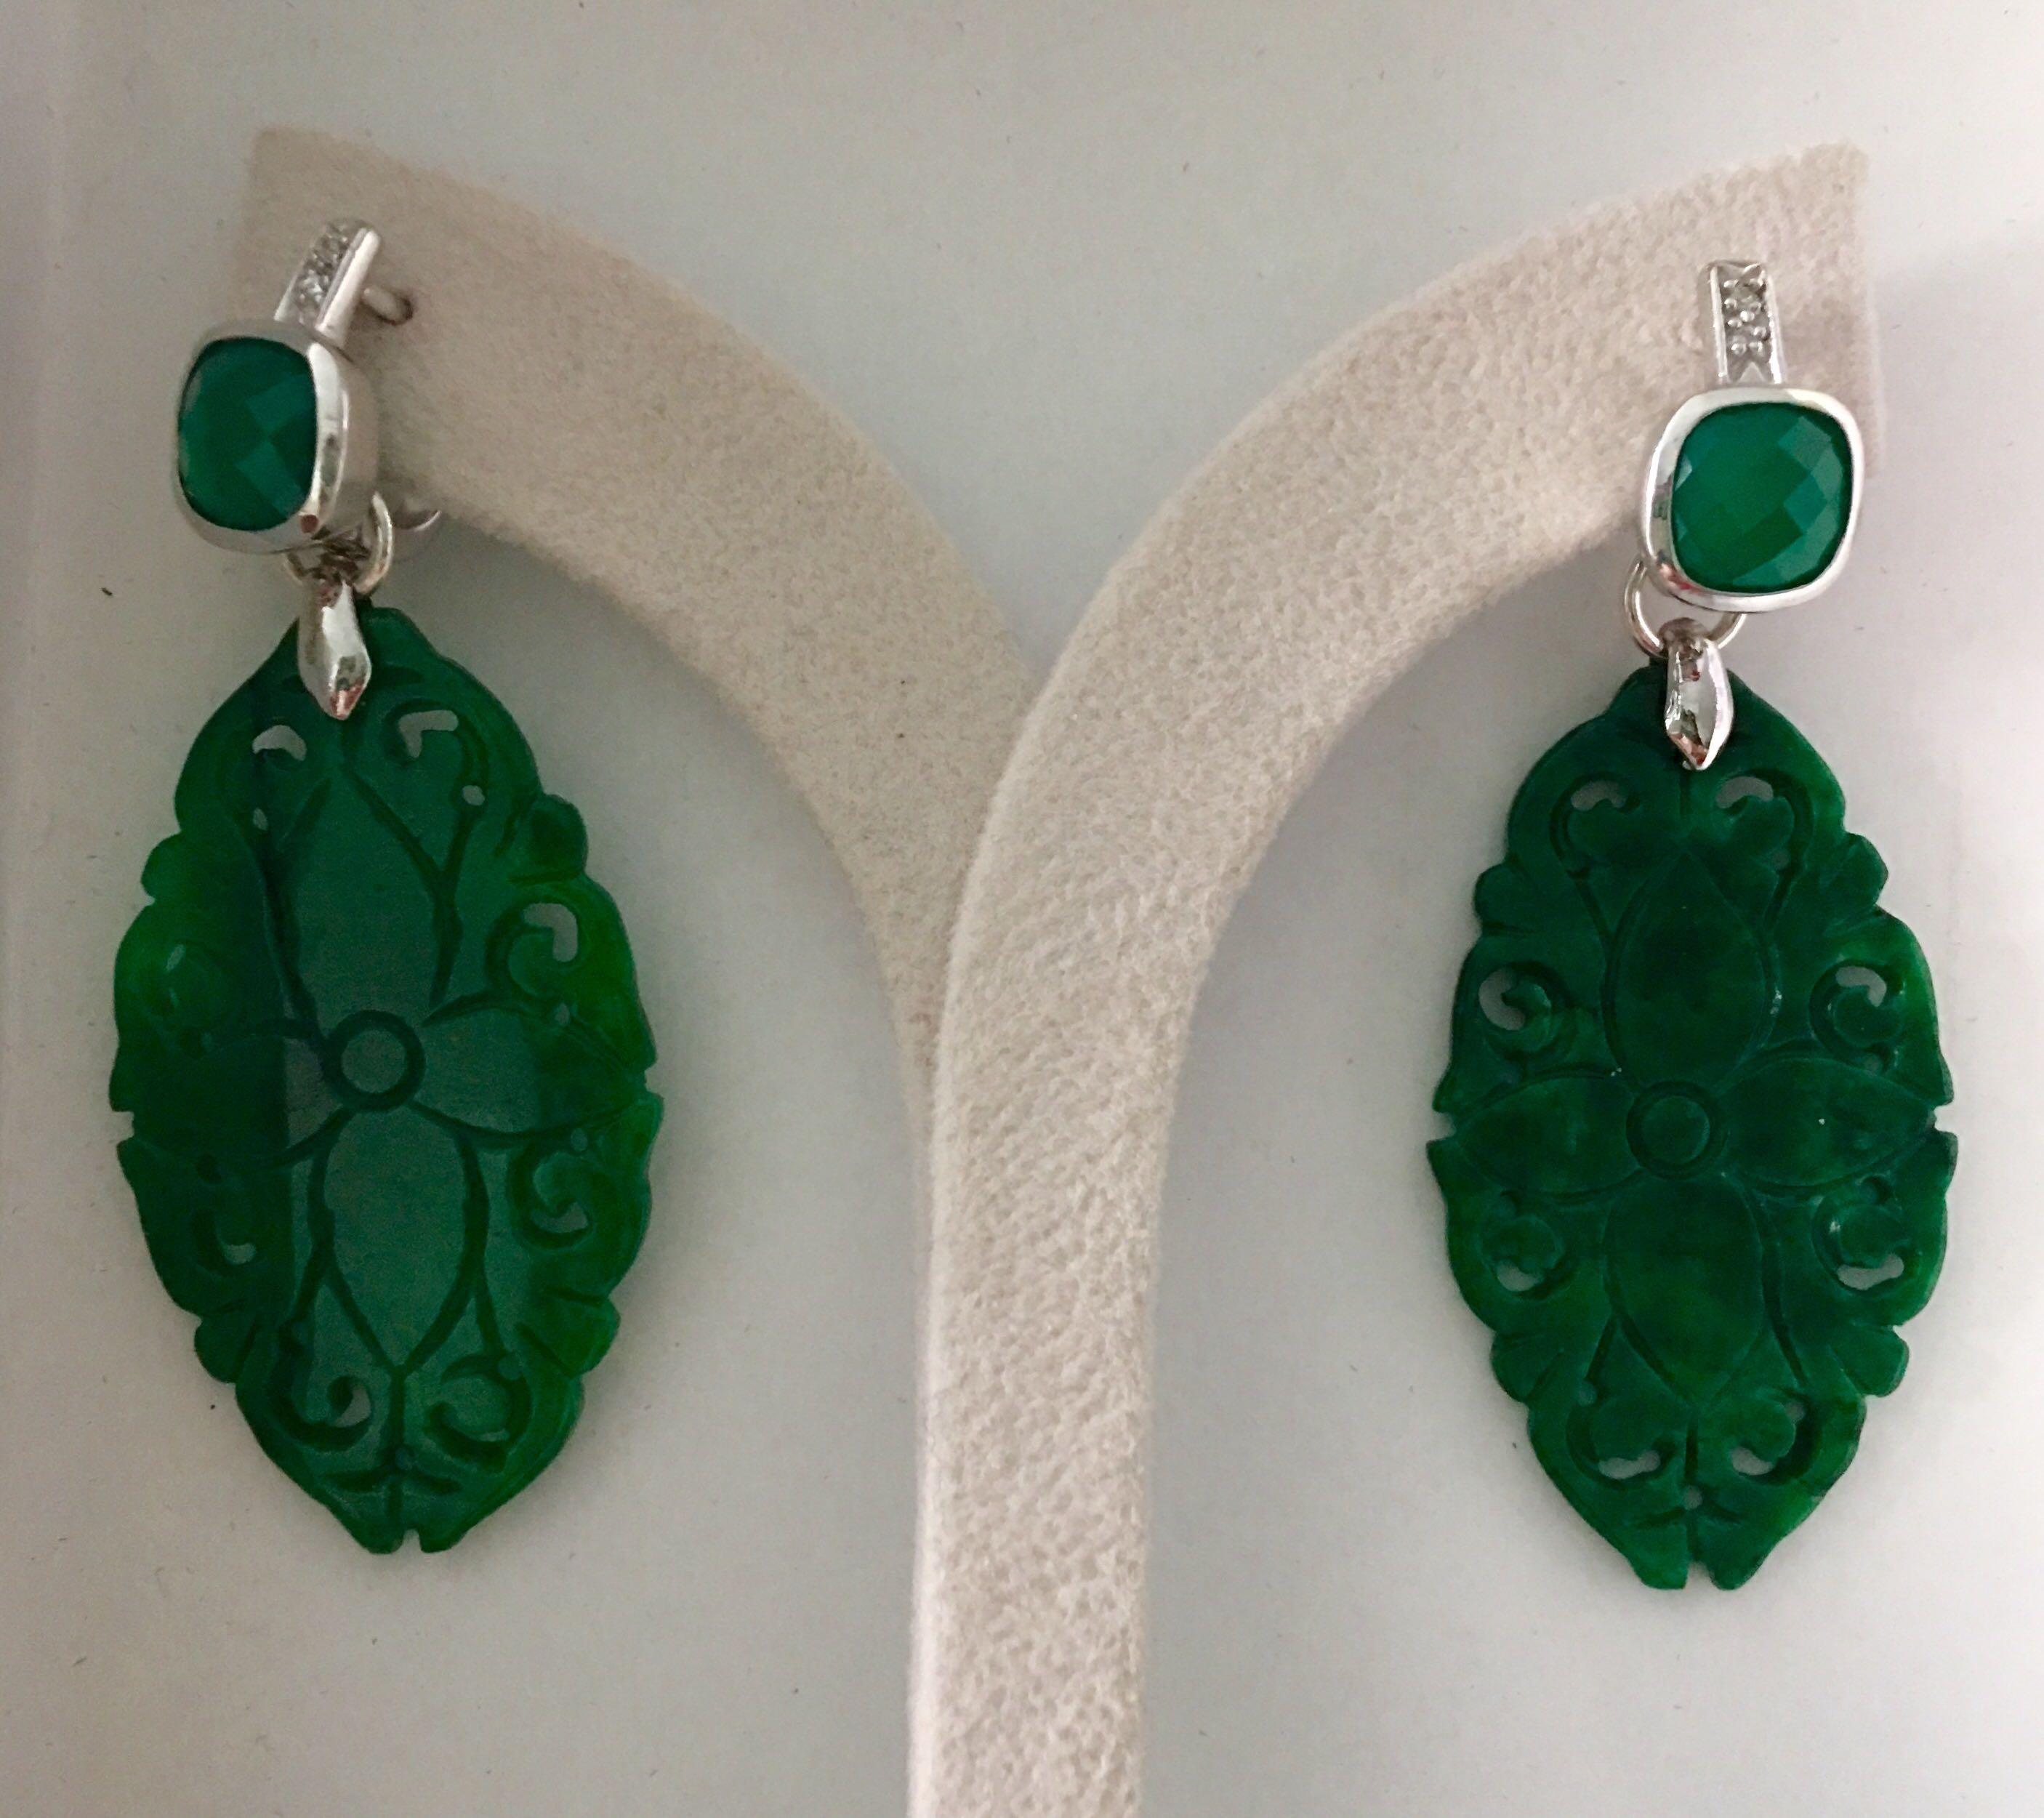 885a6f1ac Green aventurine with Burmese carved jade earrings, Luxury ...